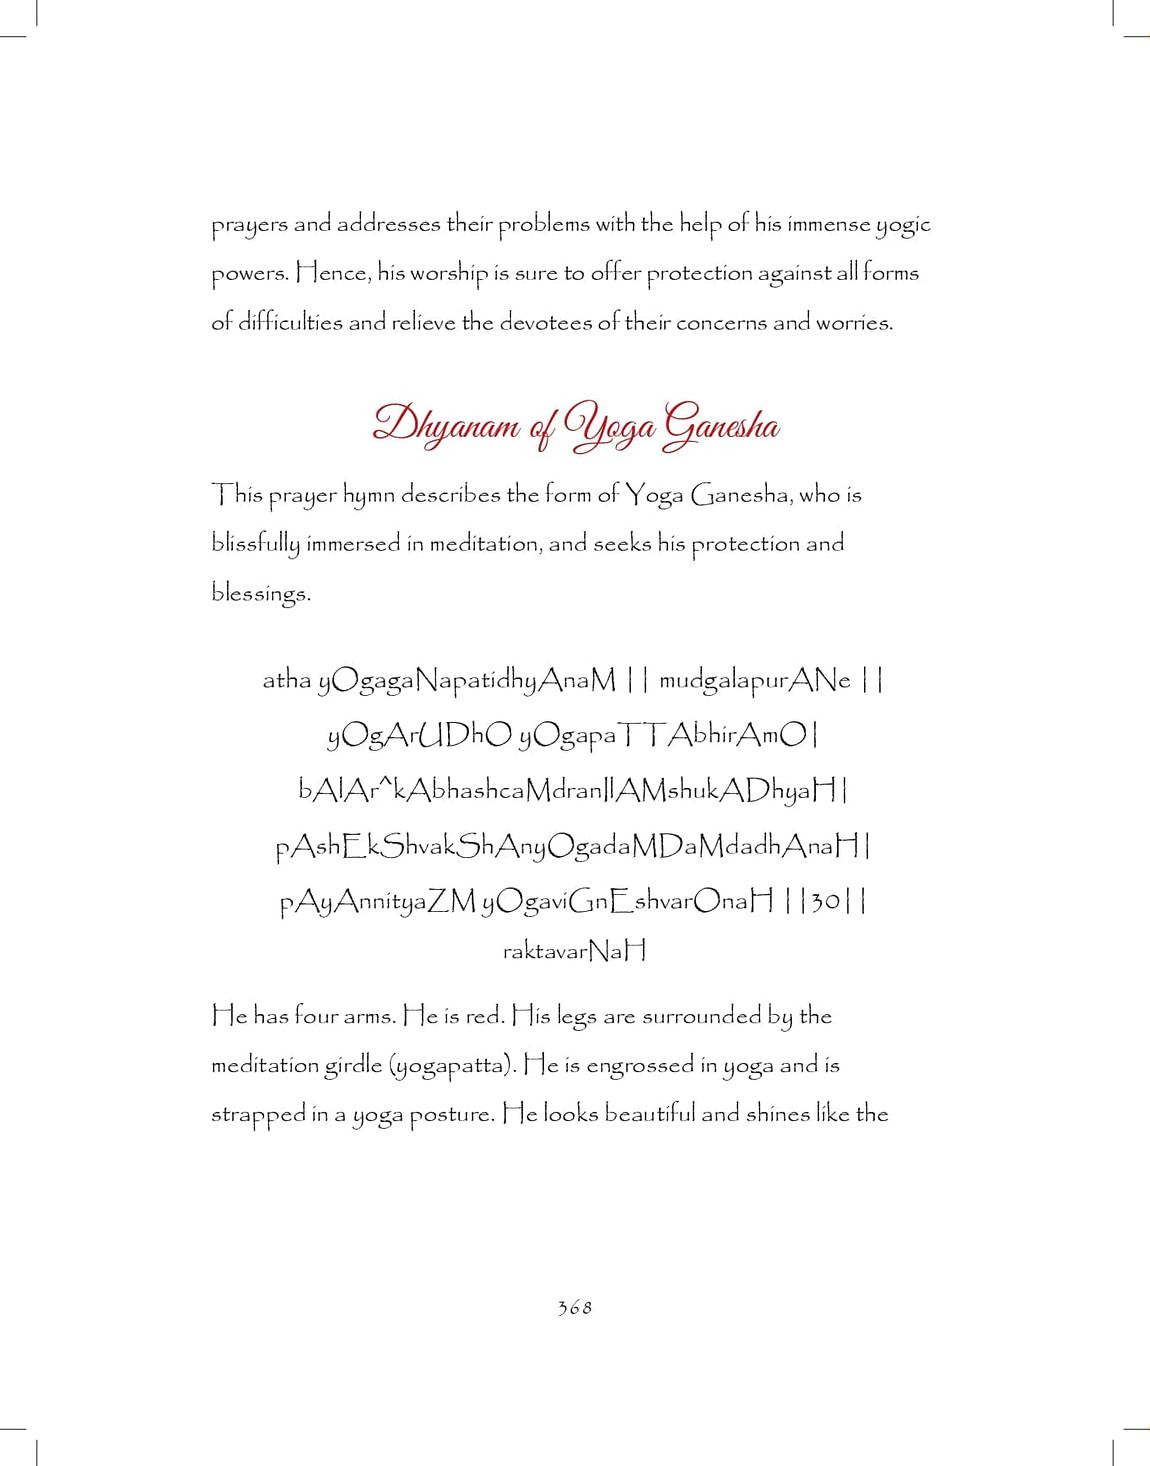 Ganesh-print_pages-to-jpg-0368.jpg